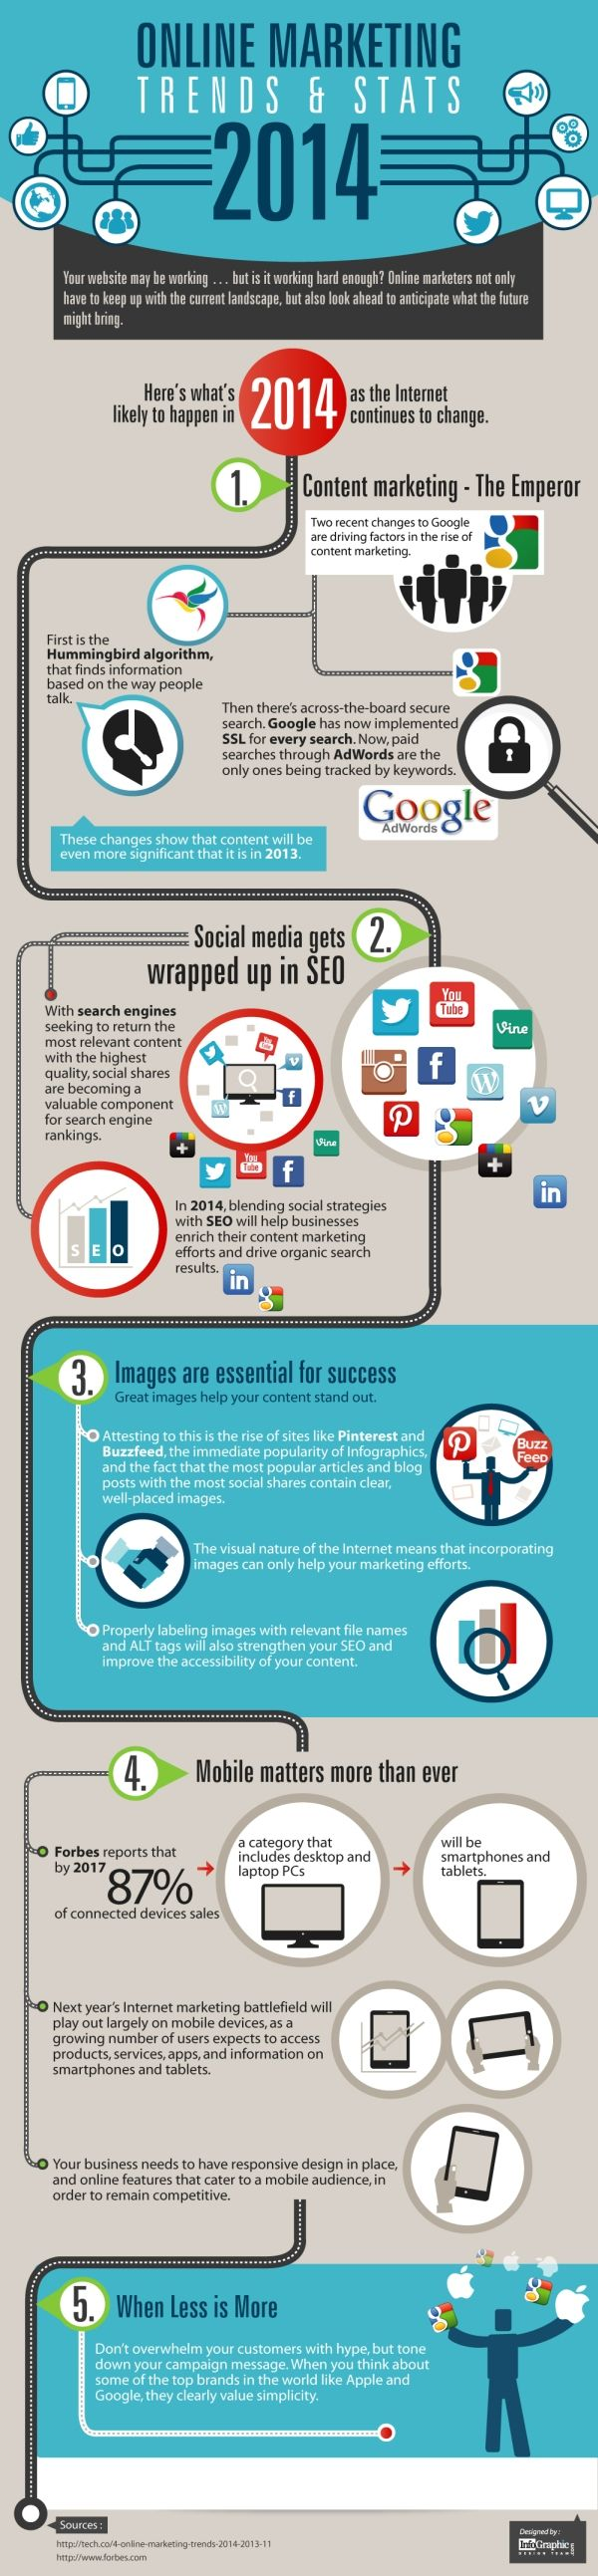 Digital-Marketing-Online-Marketing-Trends-And-Stats-2014-Infographic-Marketing-Trends Digital Marketing : Online Marketing Trends And Stats 2014   #Infographic #Marketing #Trends